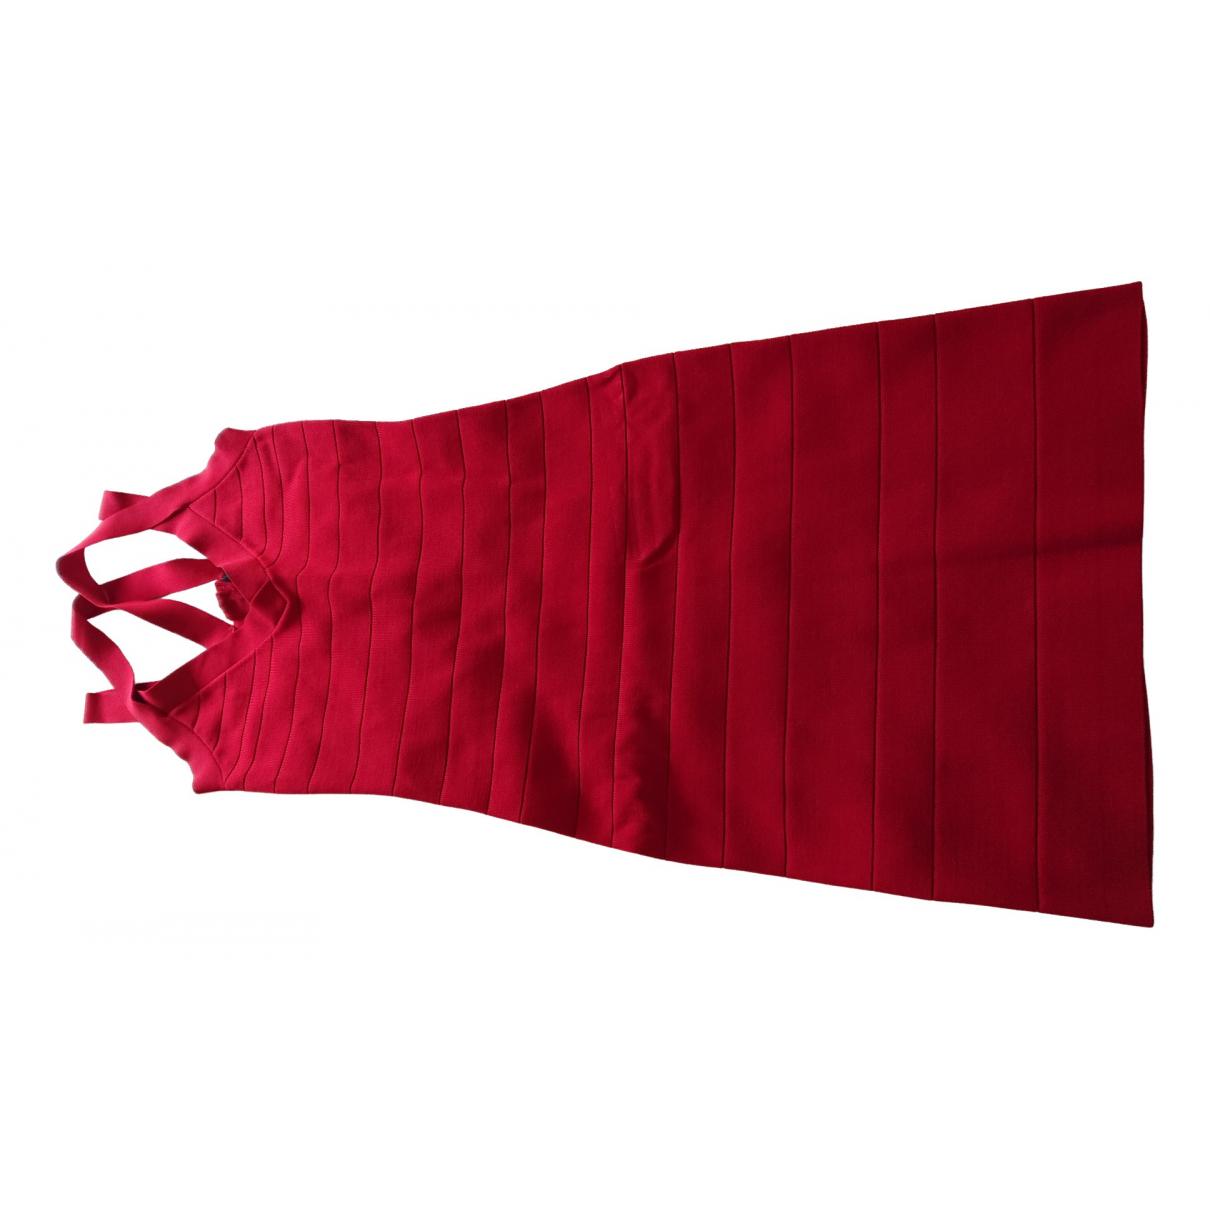 Karen Millen \N Red Cotton - elasthane dress for Women 8 UK